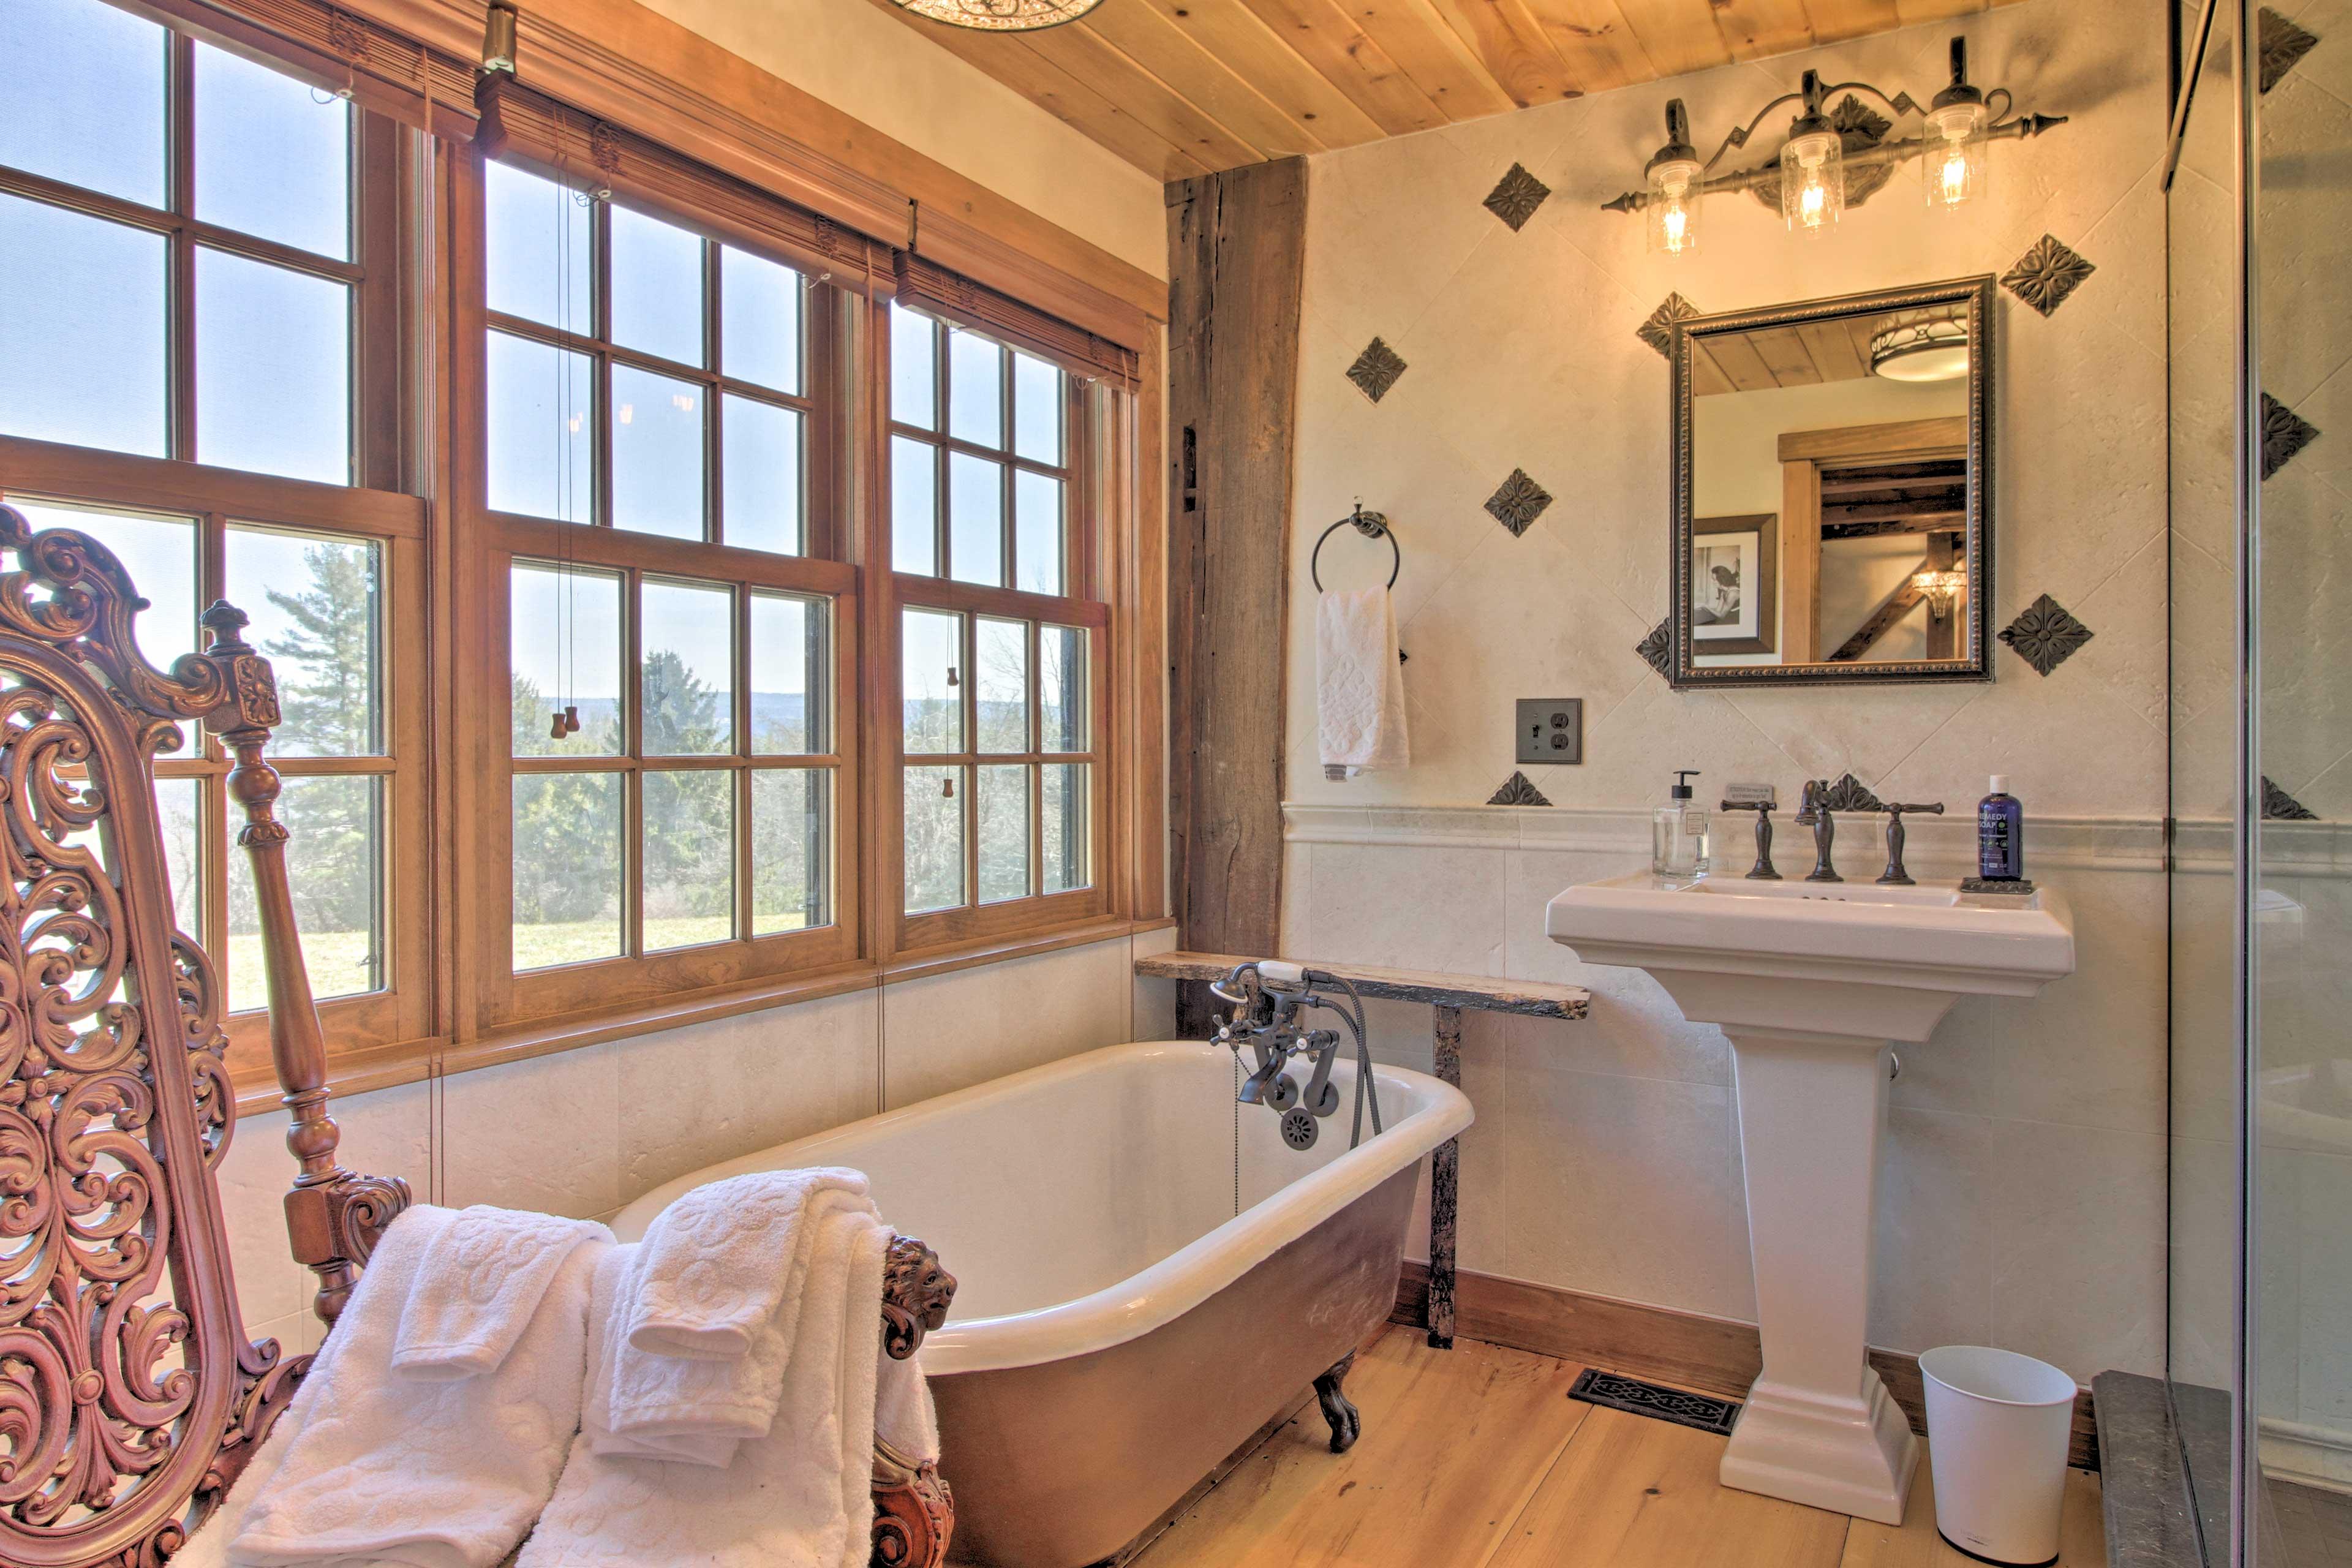 The second bathroom has an original clawfoot tub and Italian-style tiles.